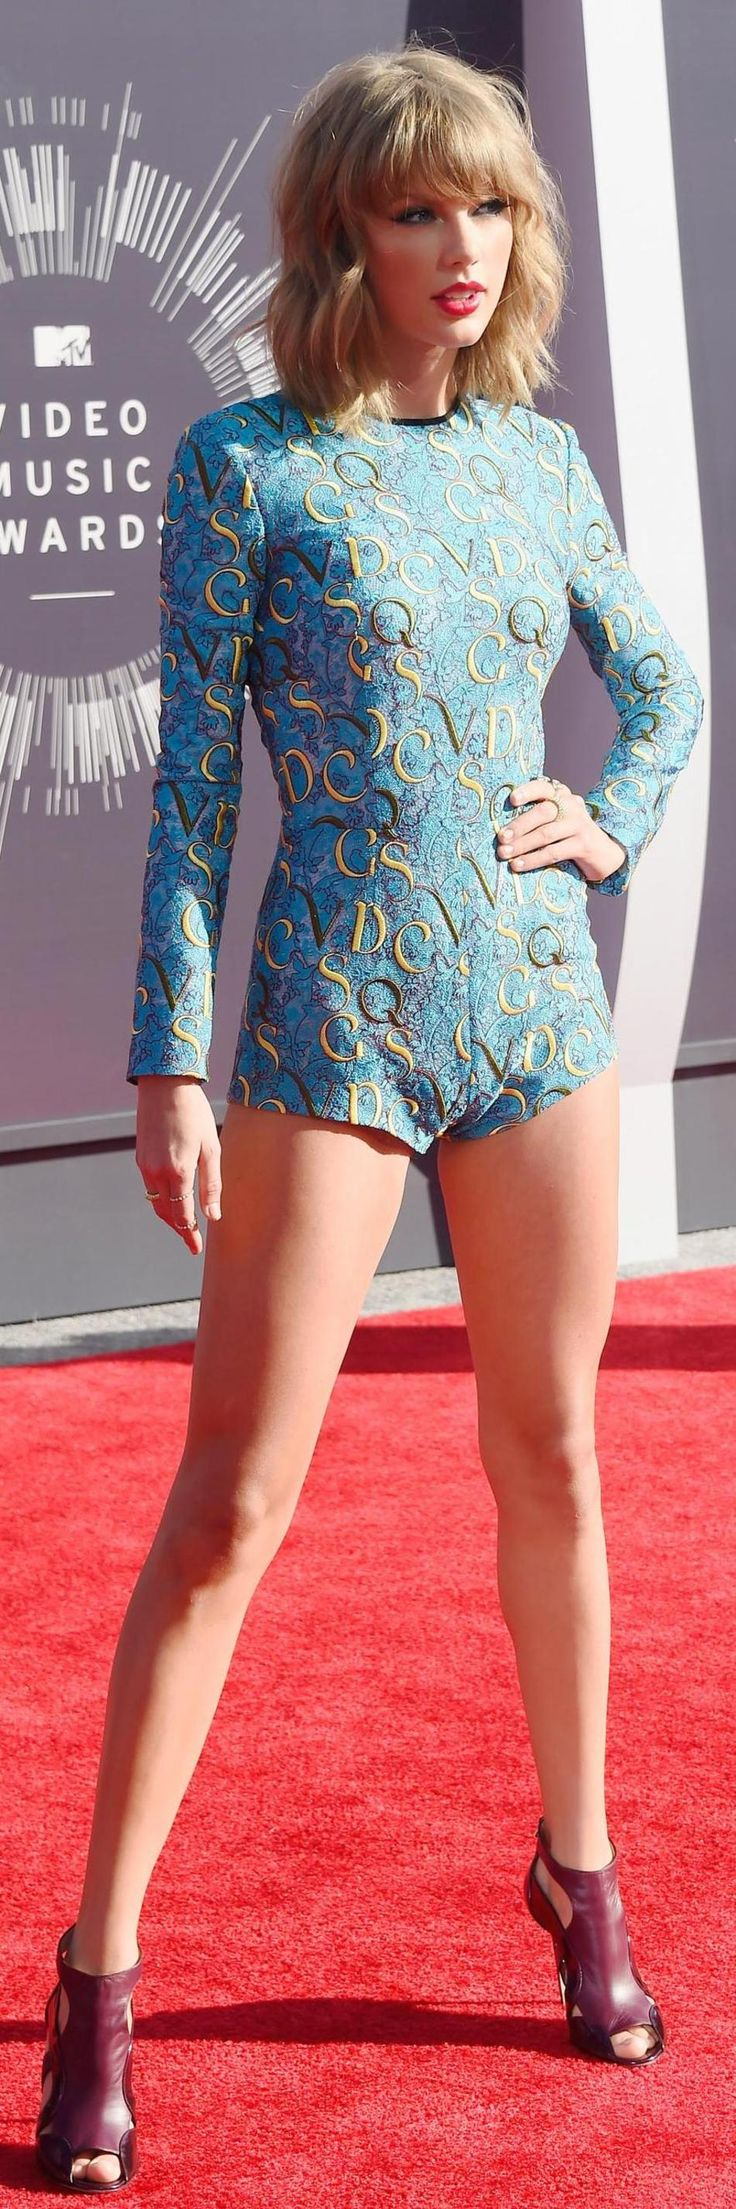 Taylor Swift mtv Awards 2014.